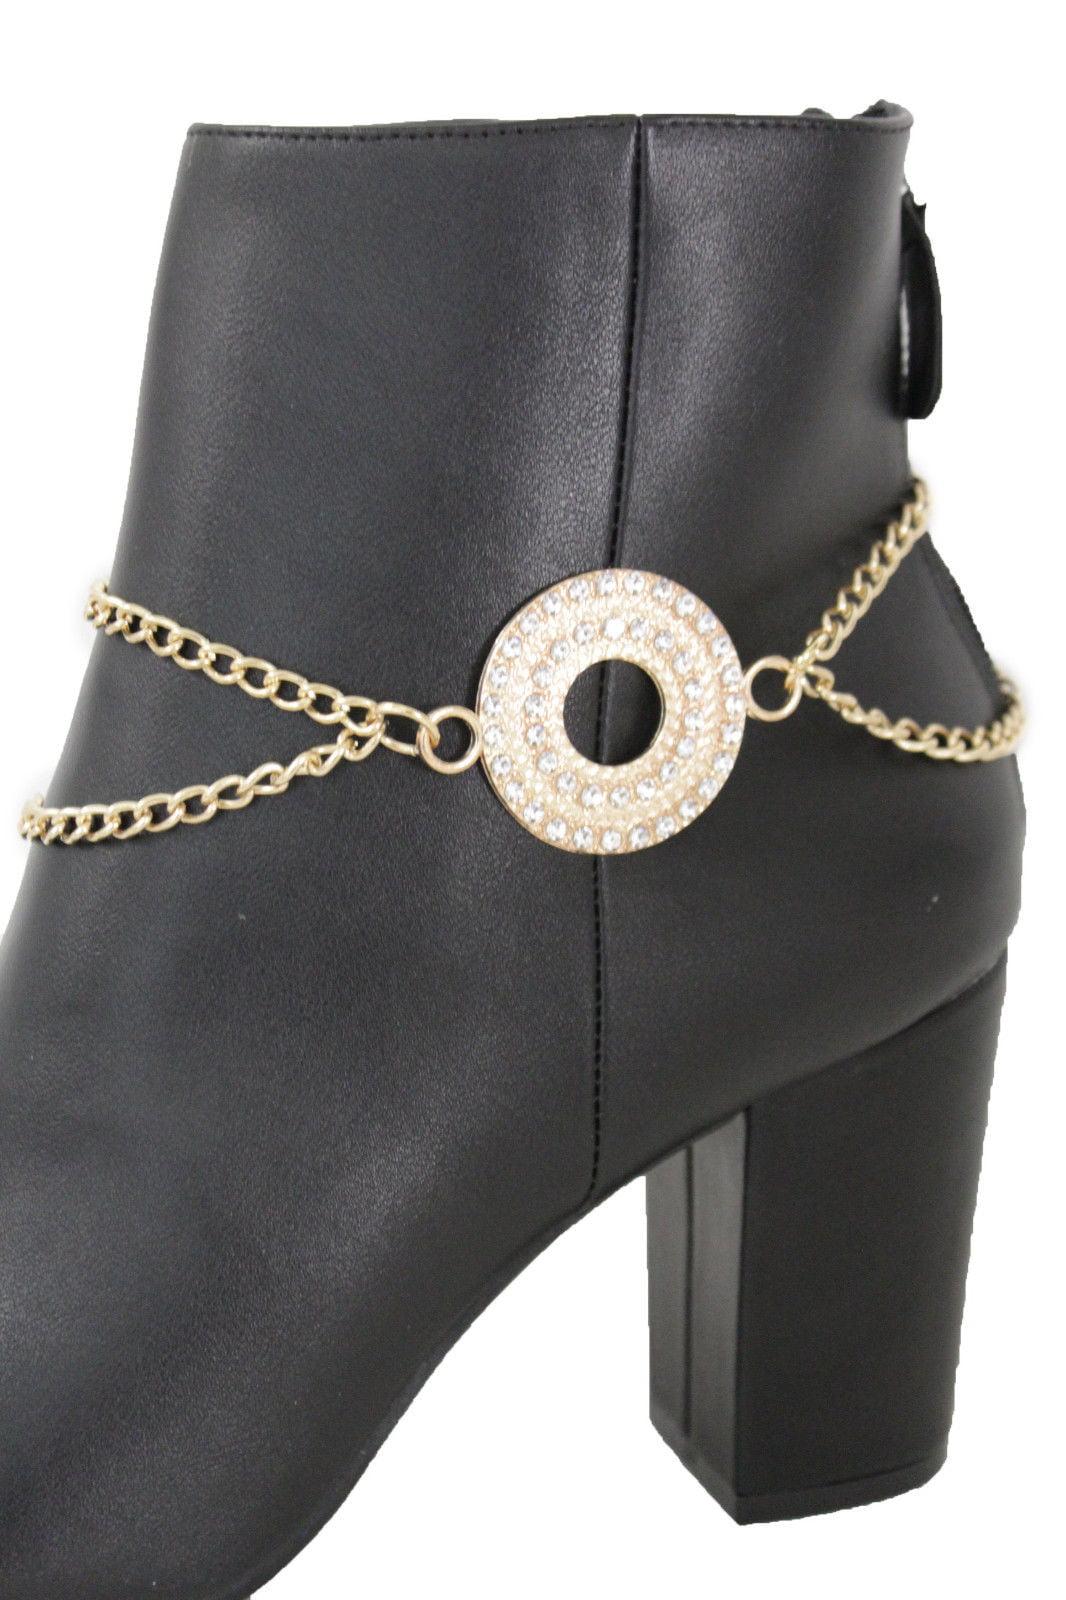 Women Silver Metal Chain Boot Bracelet Anklet Shoe Diamond Charm Jewelry Bling